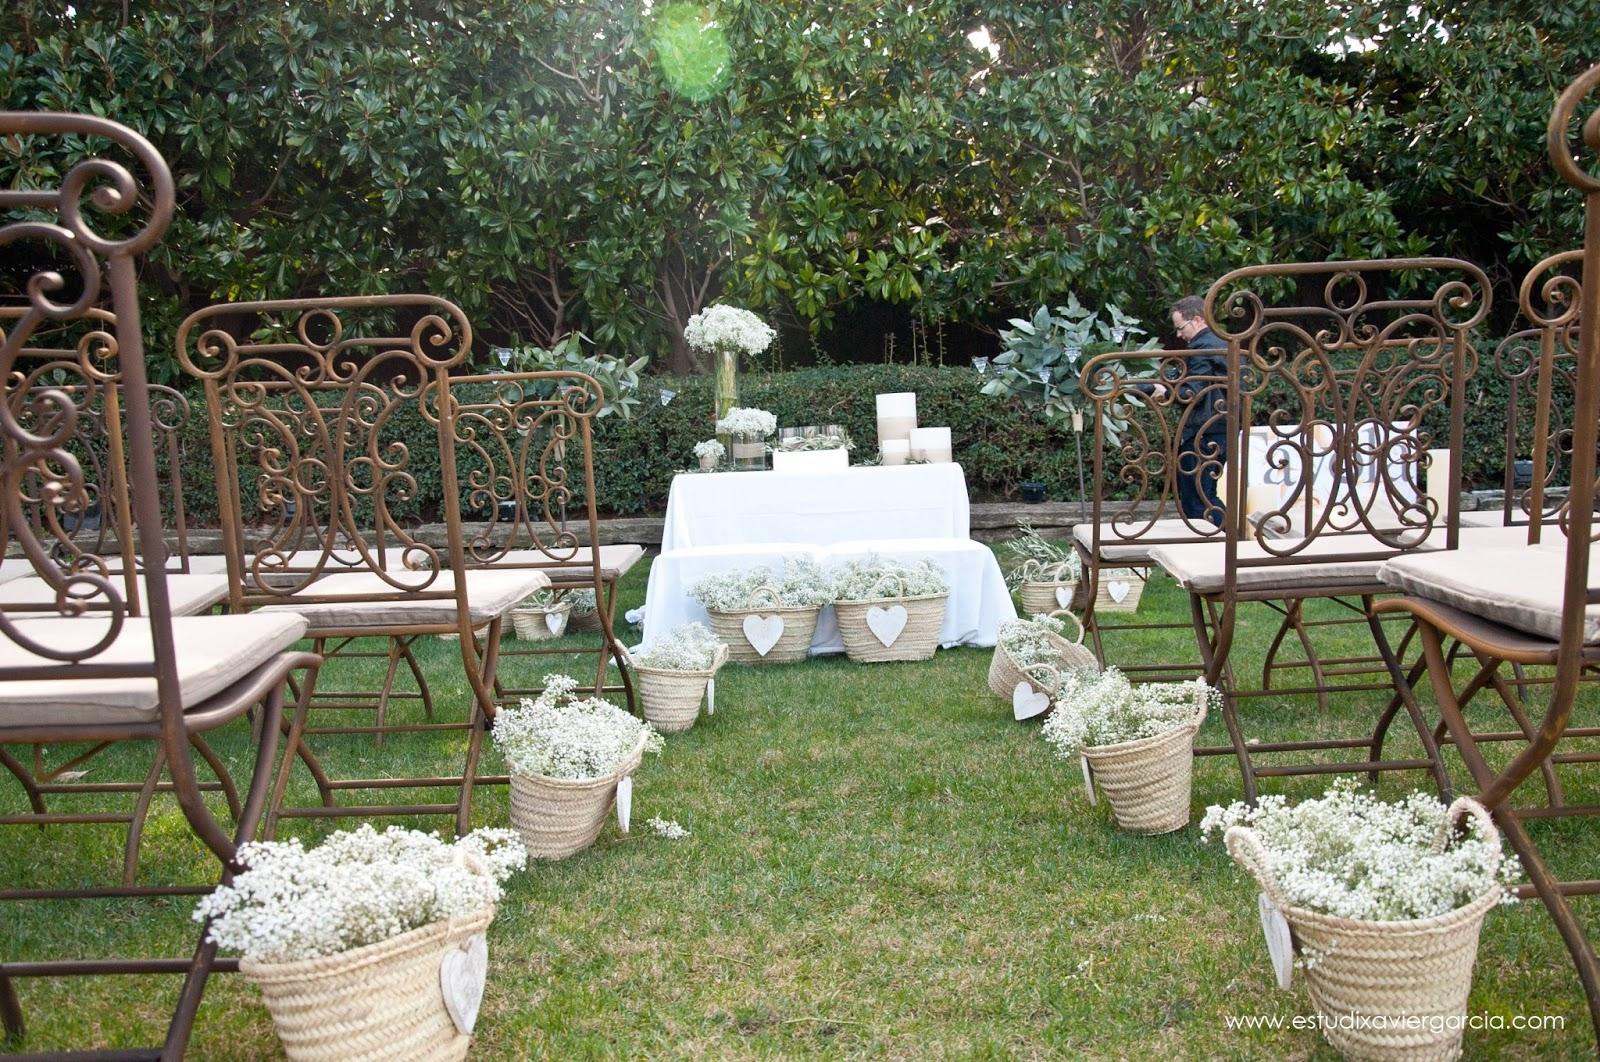 Blog mi boda hotel rey juan carlos i 5 gl - Decoracion rural ...